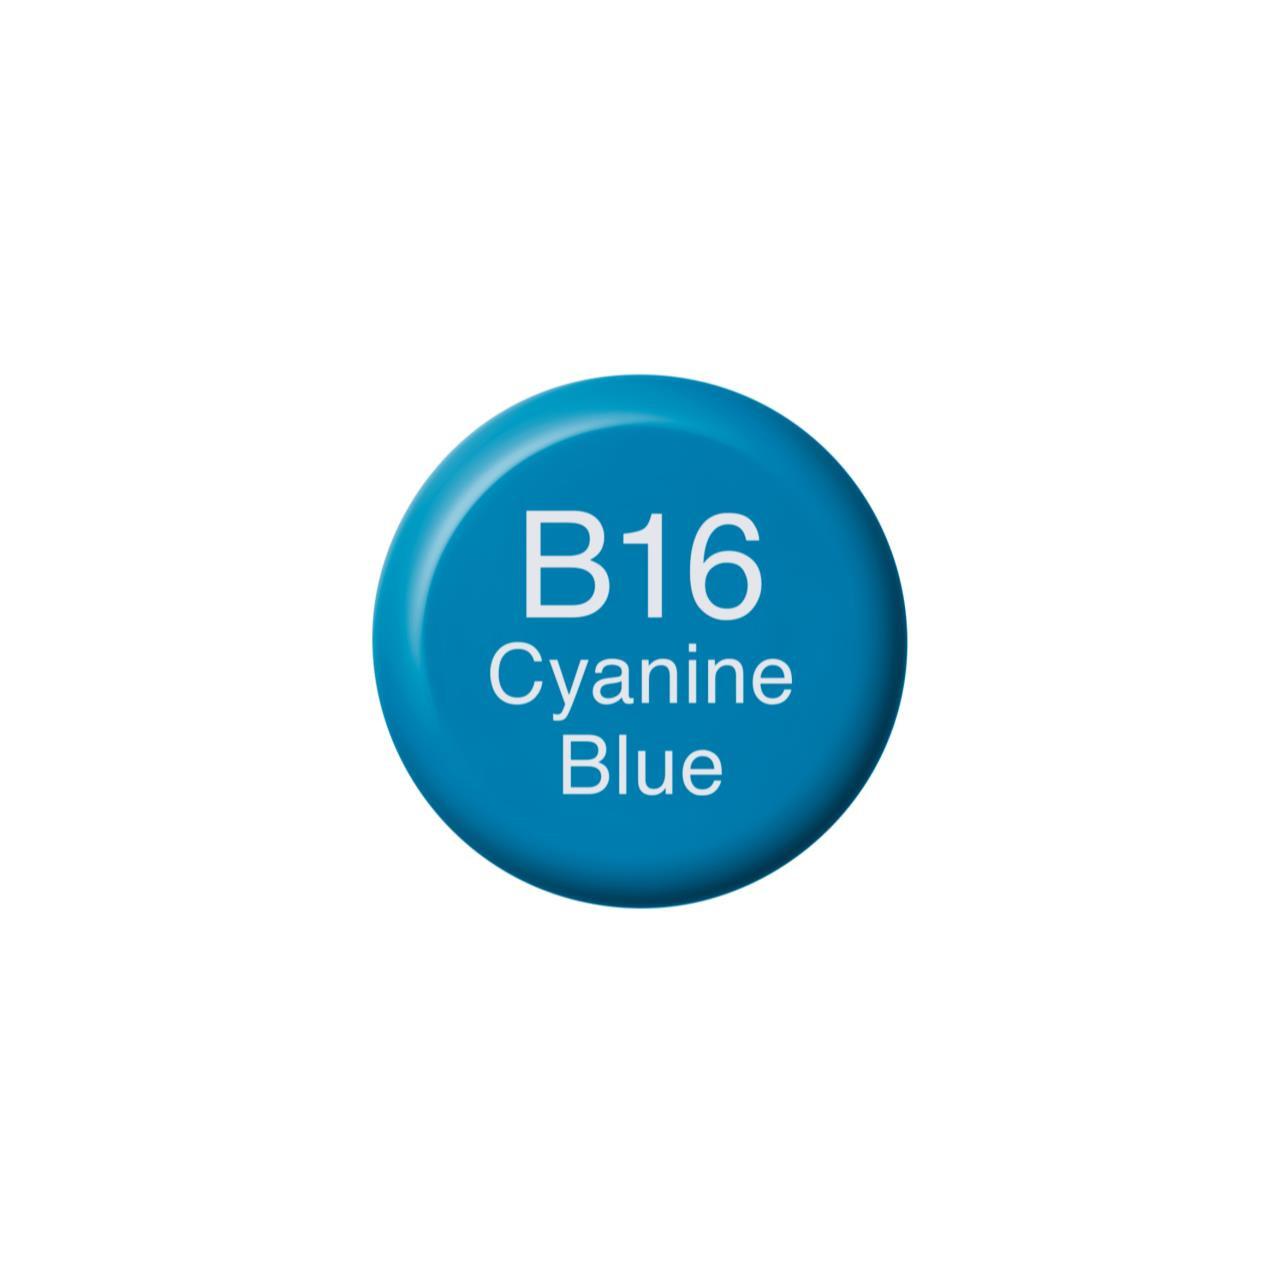 B16 Cyanine Blue, Copic Ink - 4511338055908